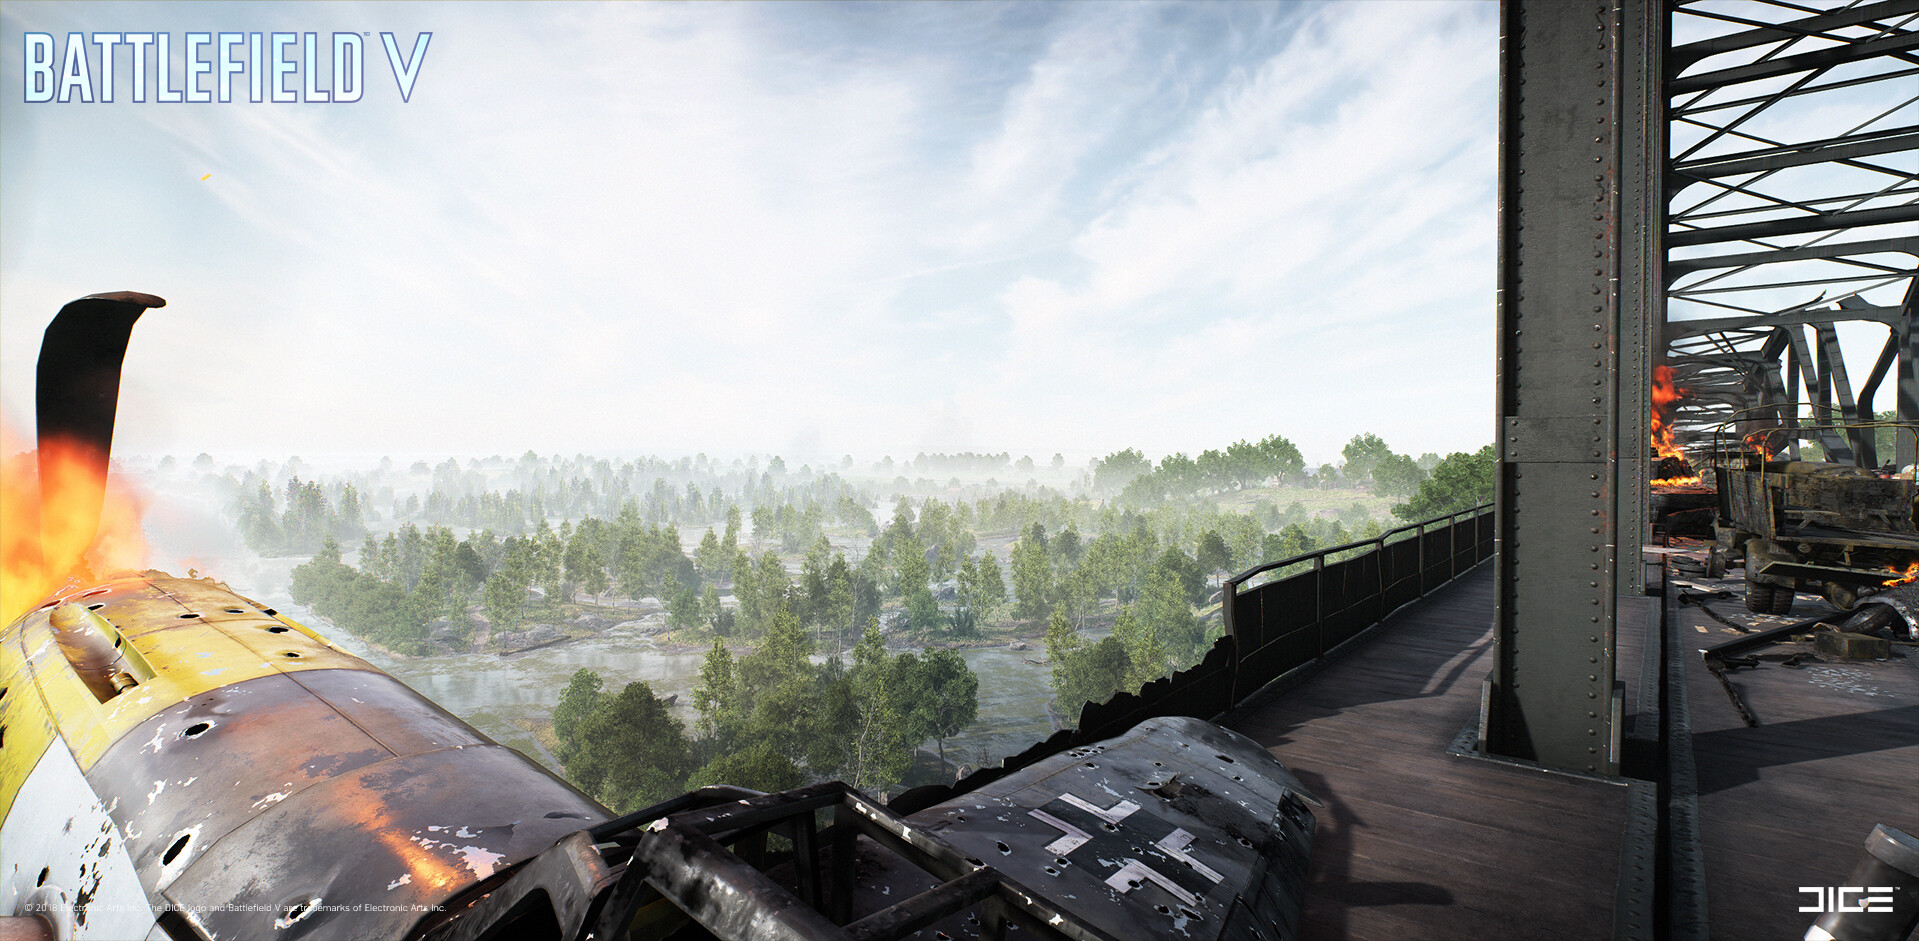 ArtStation - Battlefield V - Twisted Steel, EA DICE